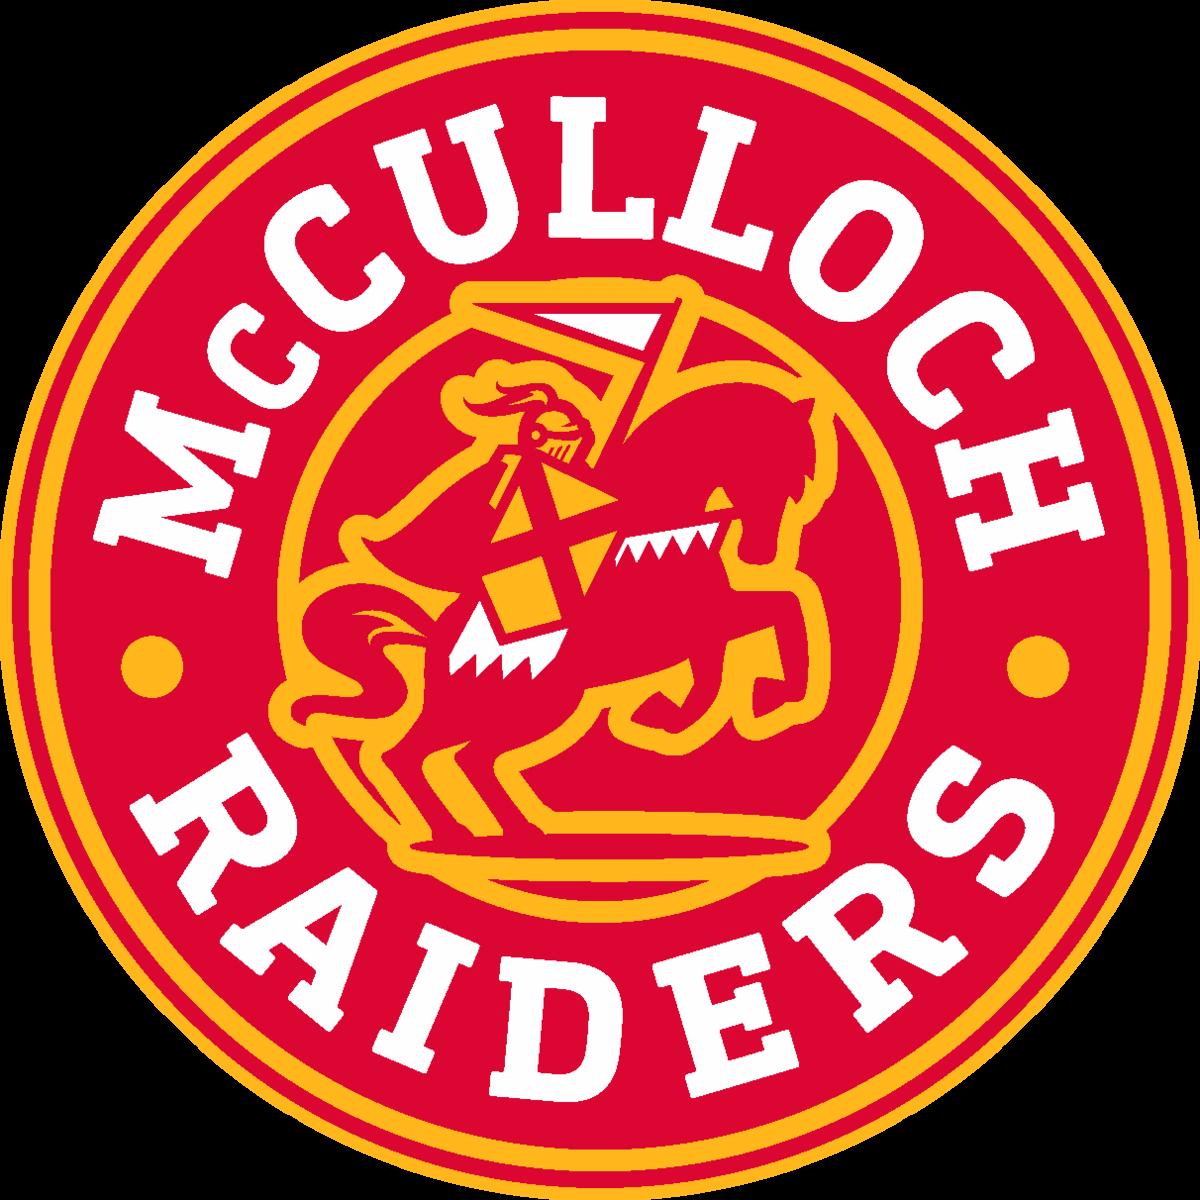 McCulloch Raider logo